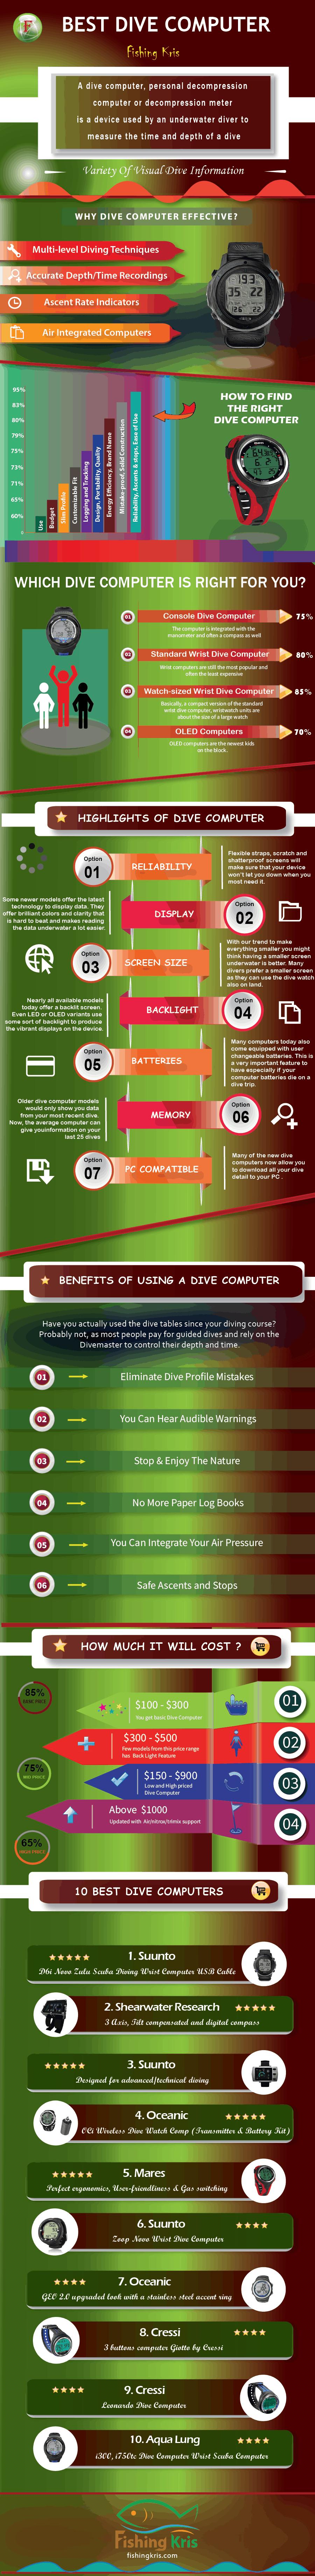 Best Dive Computer